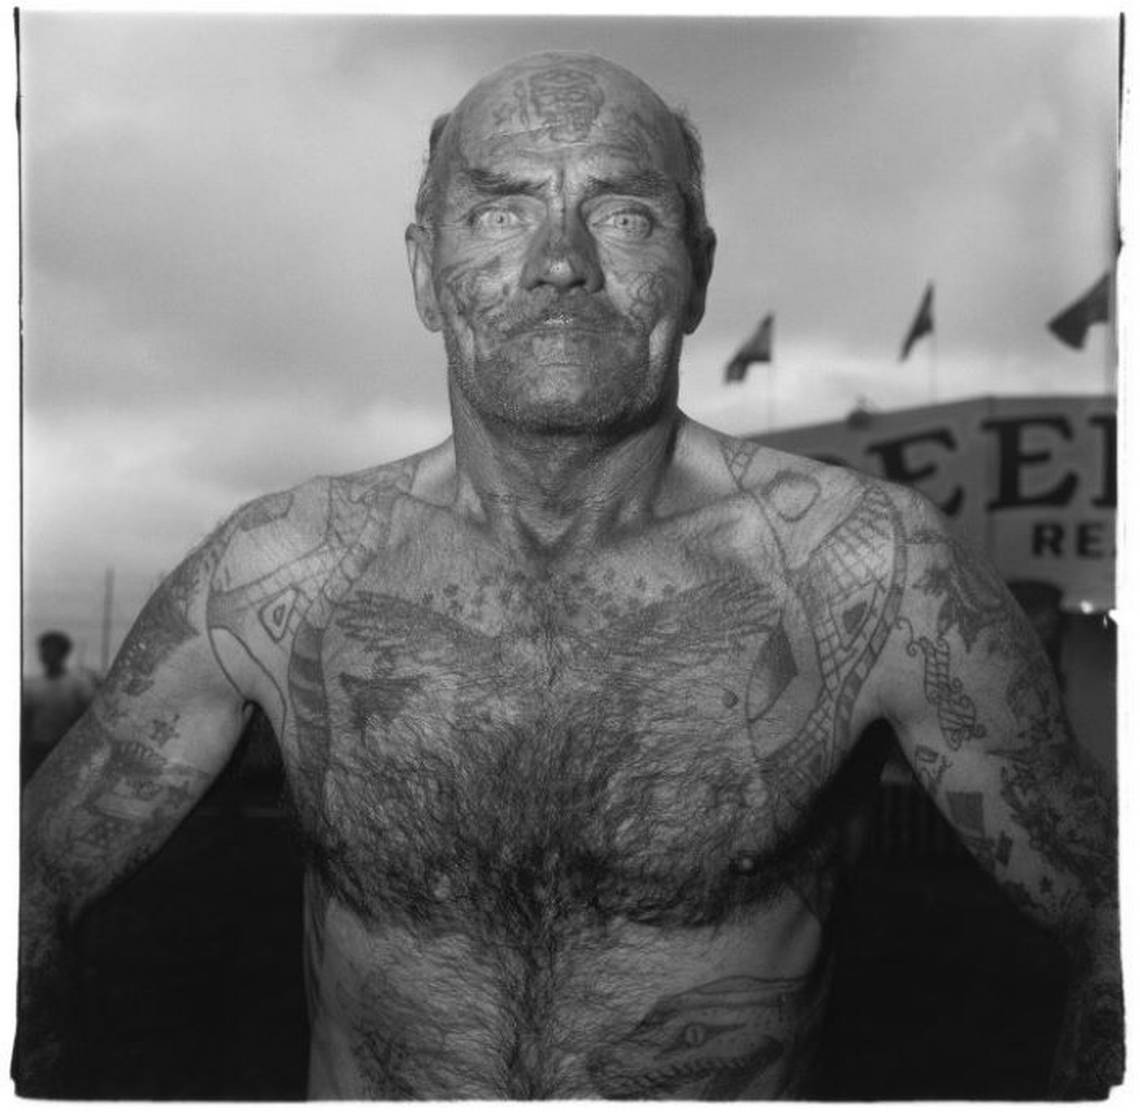 Diane Arbus, Tattoed Man at a Carnival, 1970